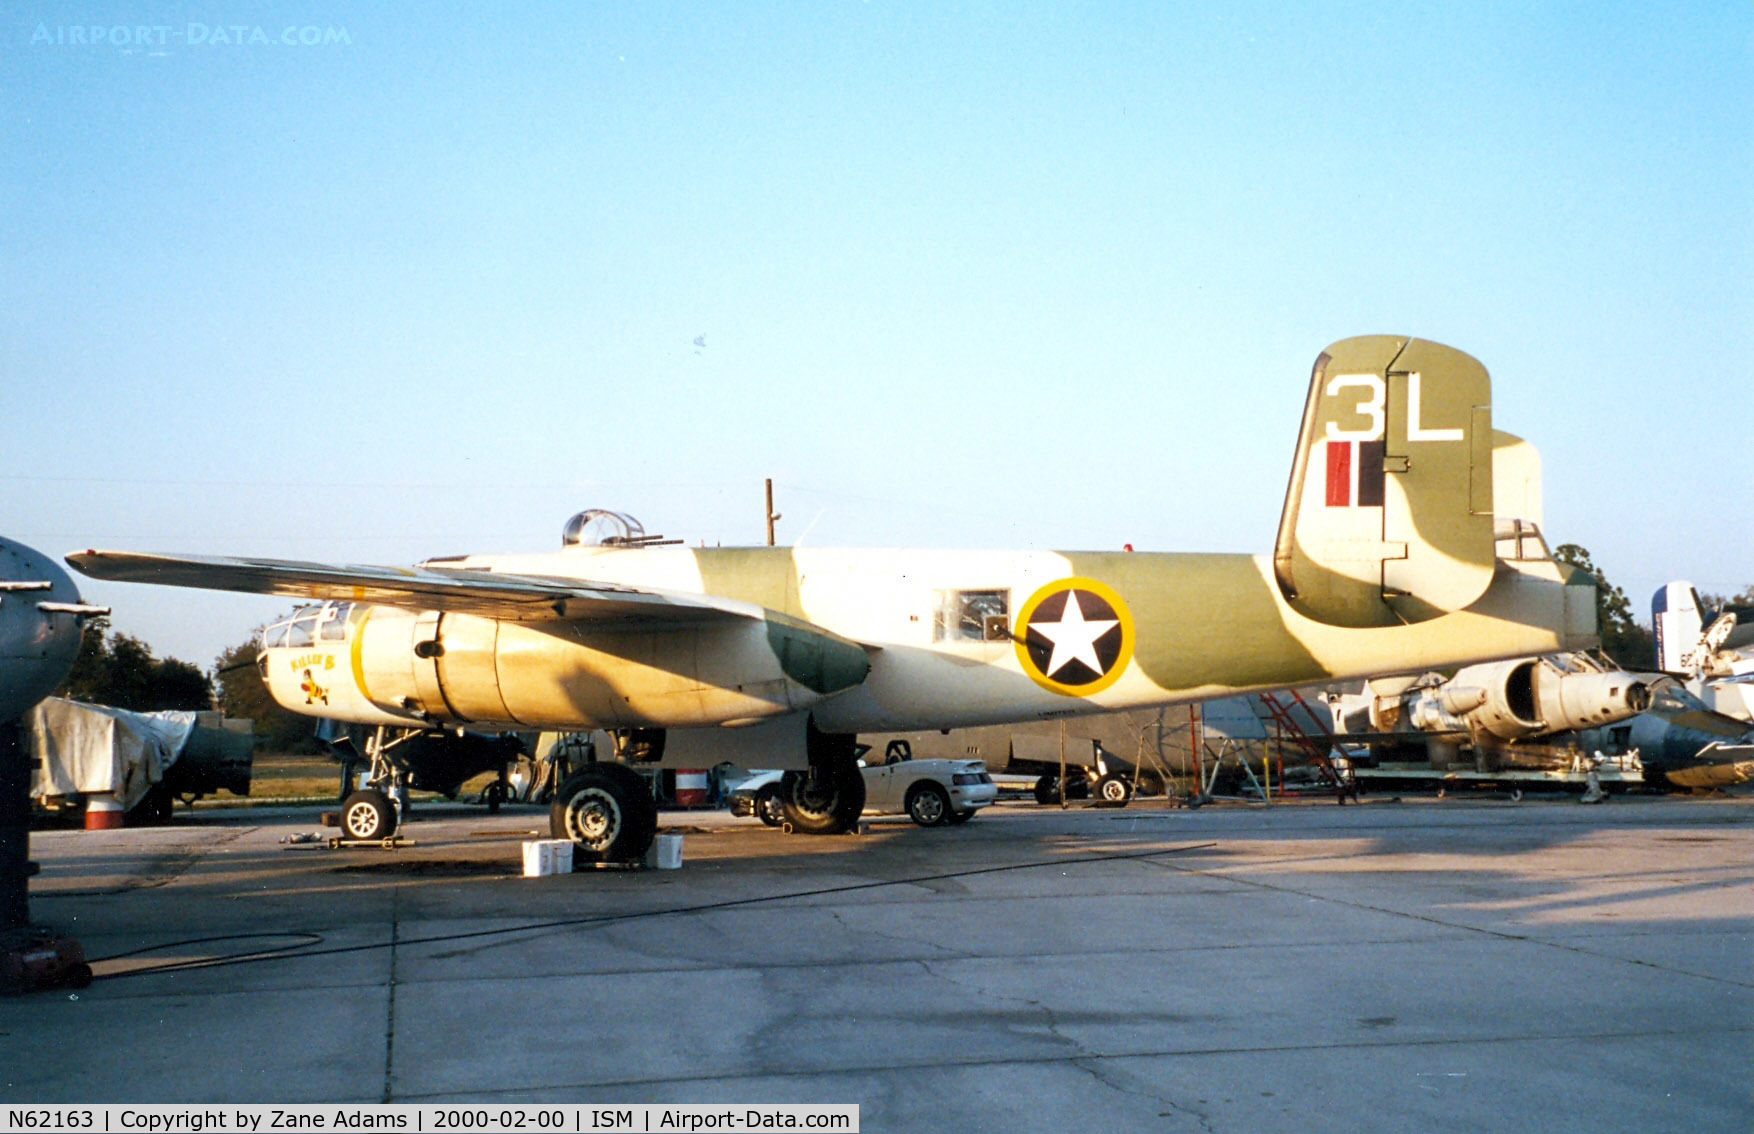 N62163, 1944 North American B-25J C/N 44-86697, Killer B at Reilly Aviation